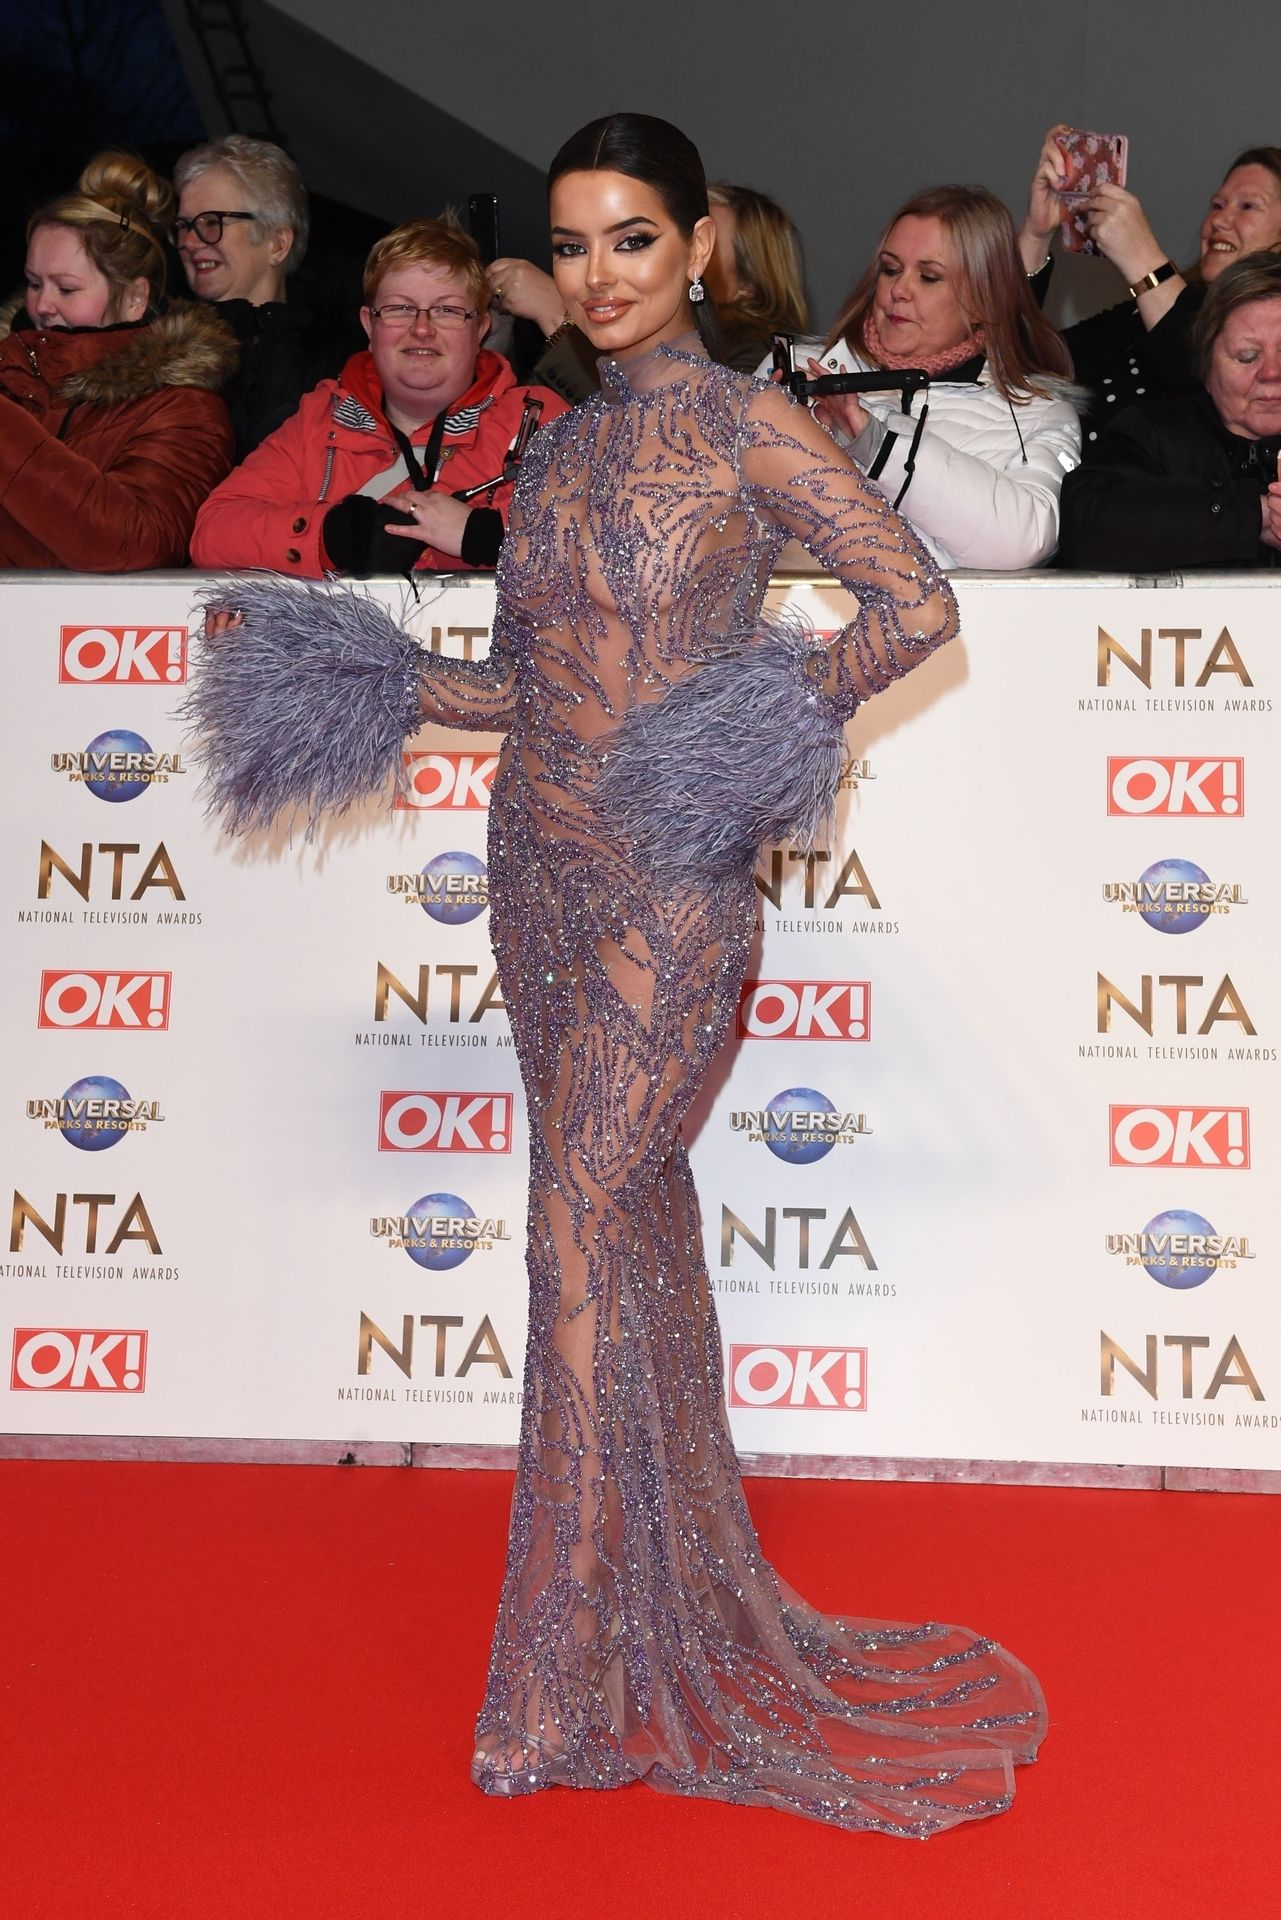 Maura Higgins Looks Hot At The National Television Awards 0001